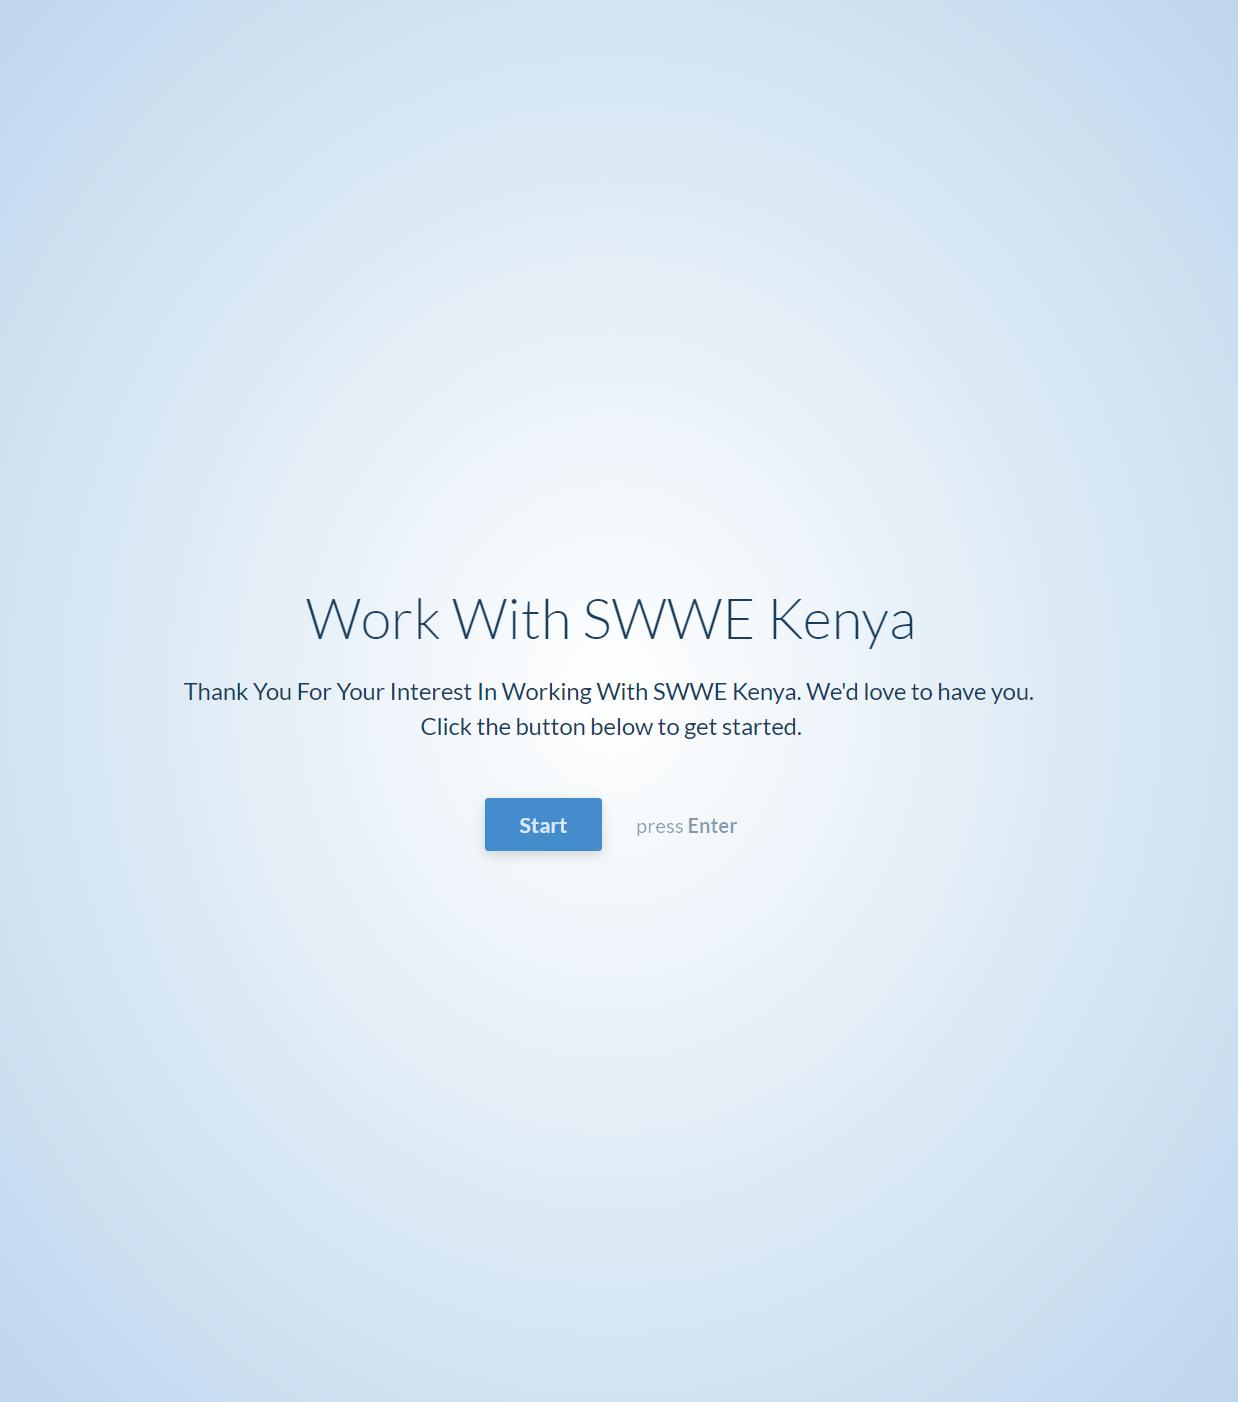 Work-With-SWWE-Kenya